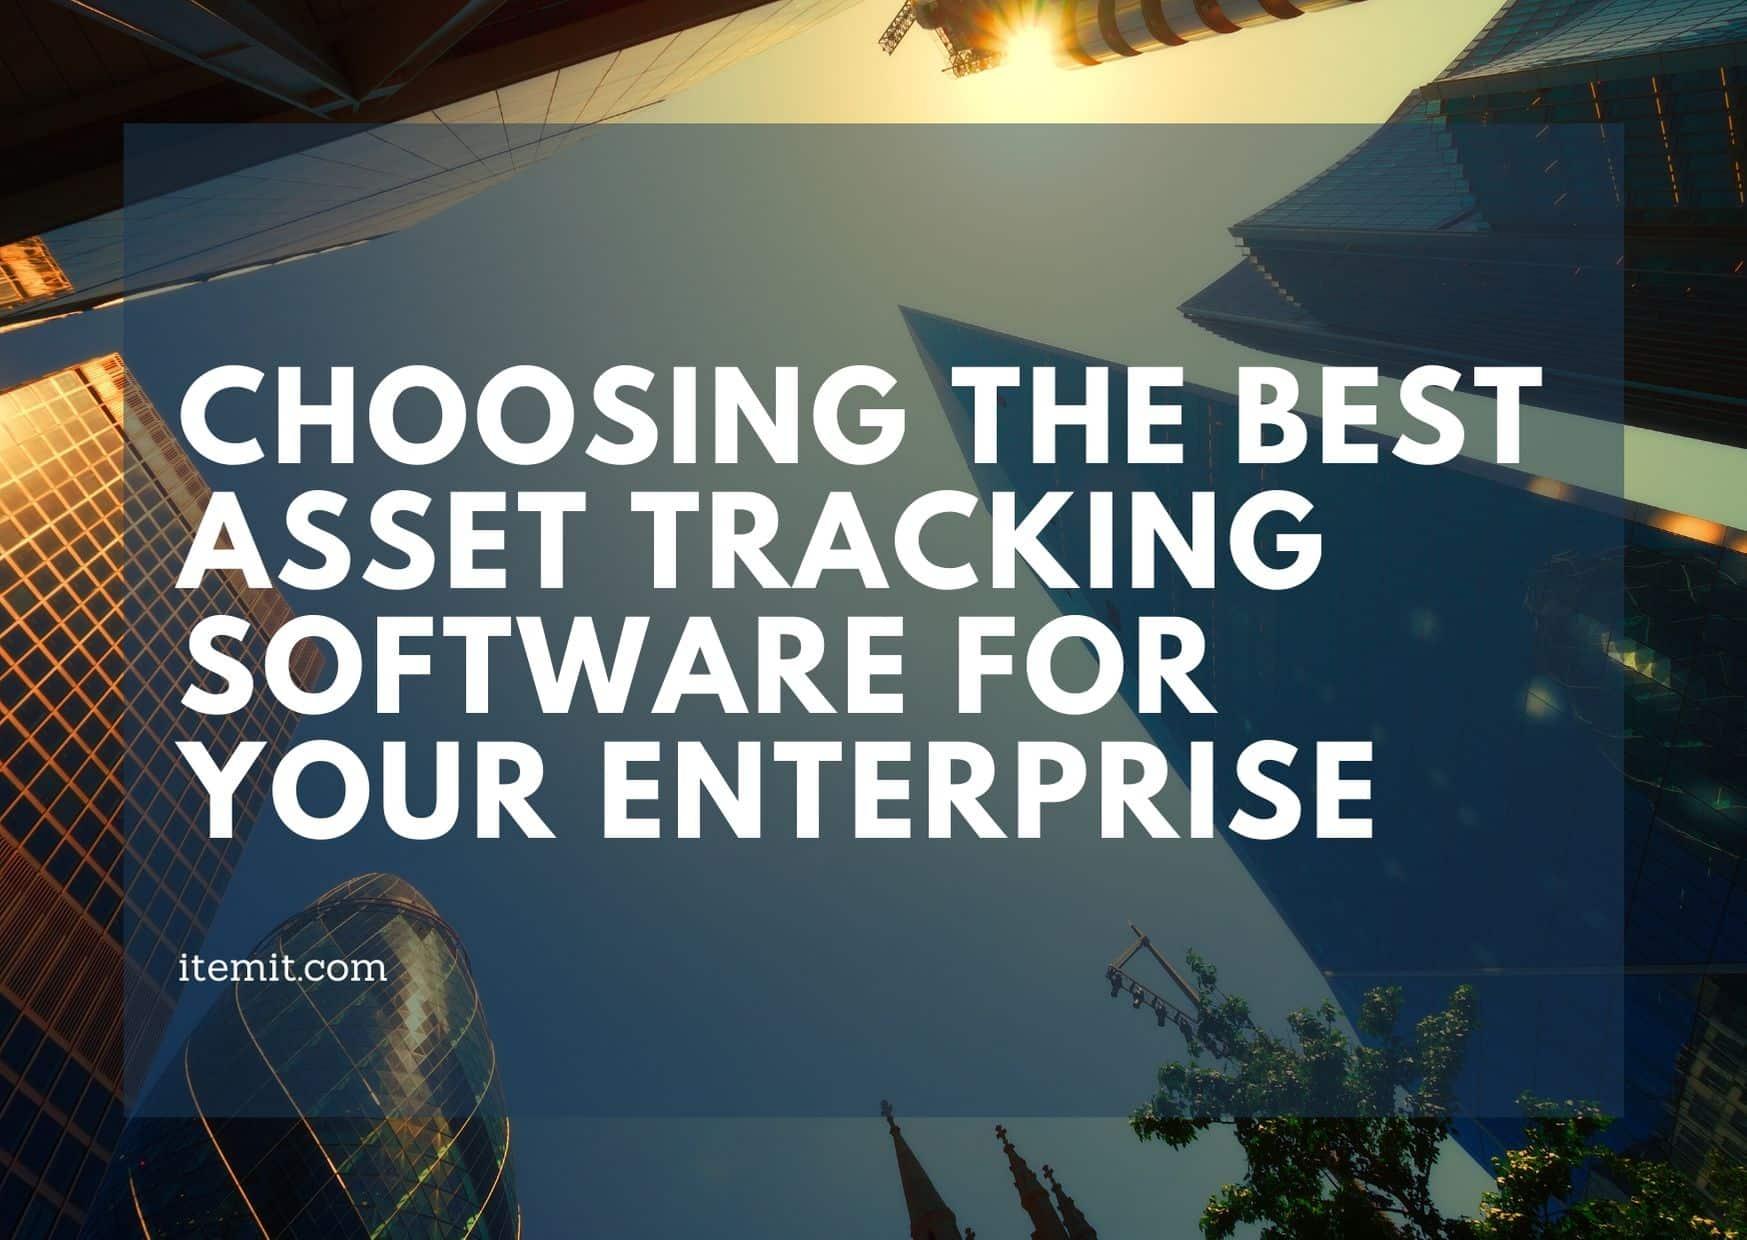 Asset Tracking Software - Choosing the best